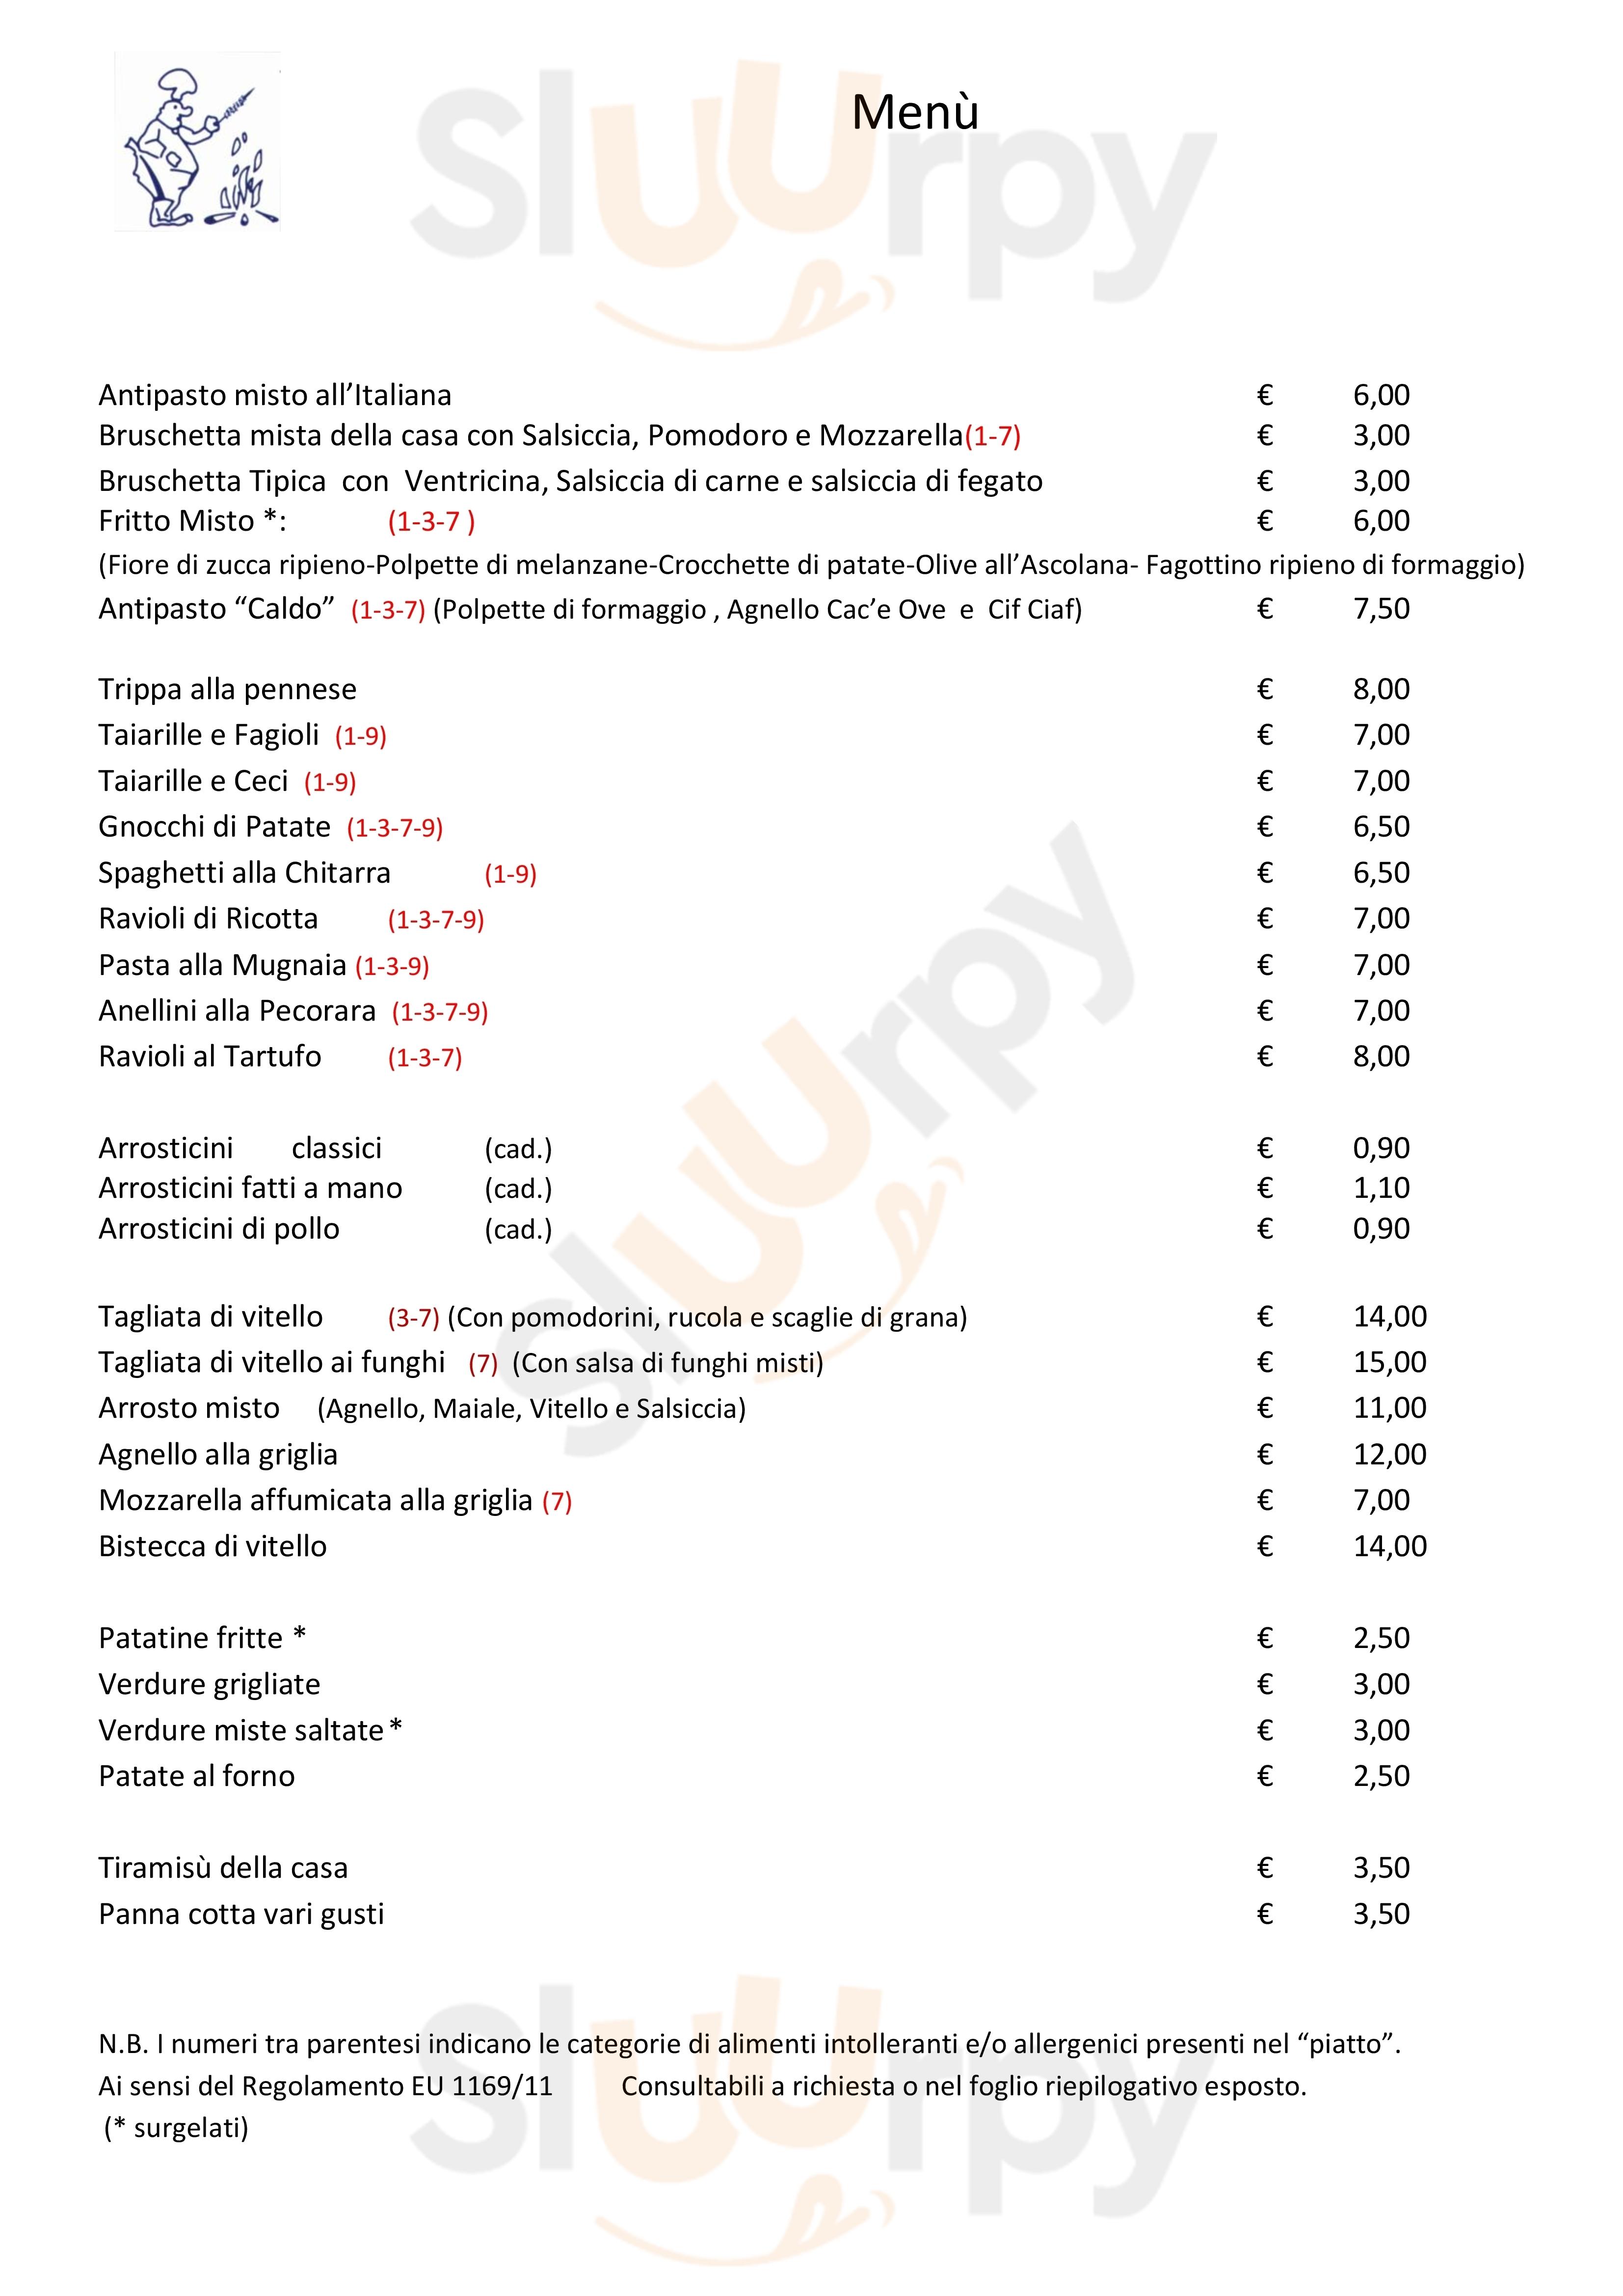 Ristorante Hostaria Vestina Montesilvano menù 1 pagina